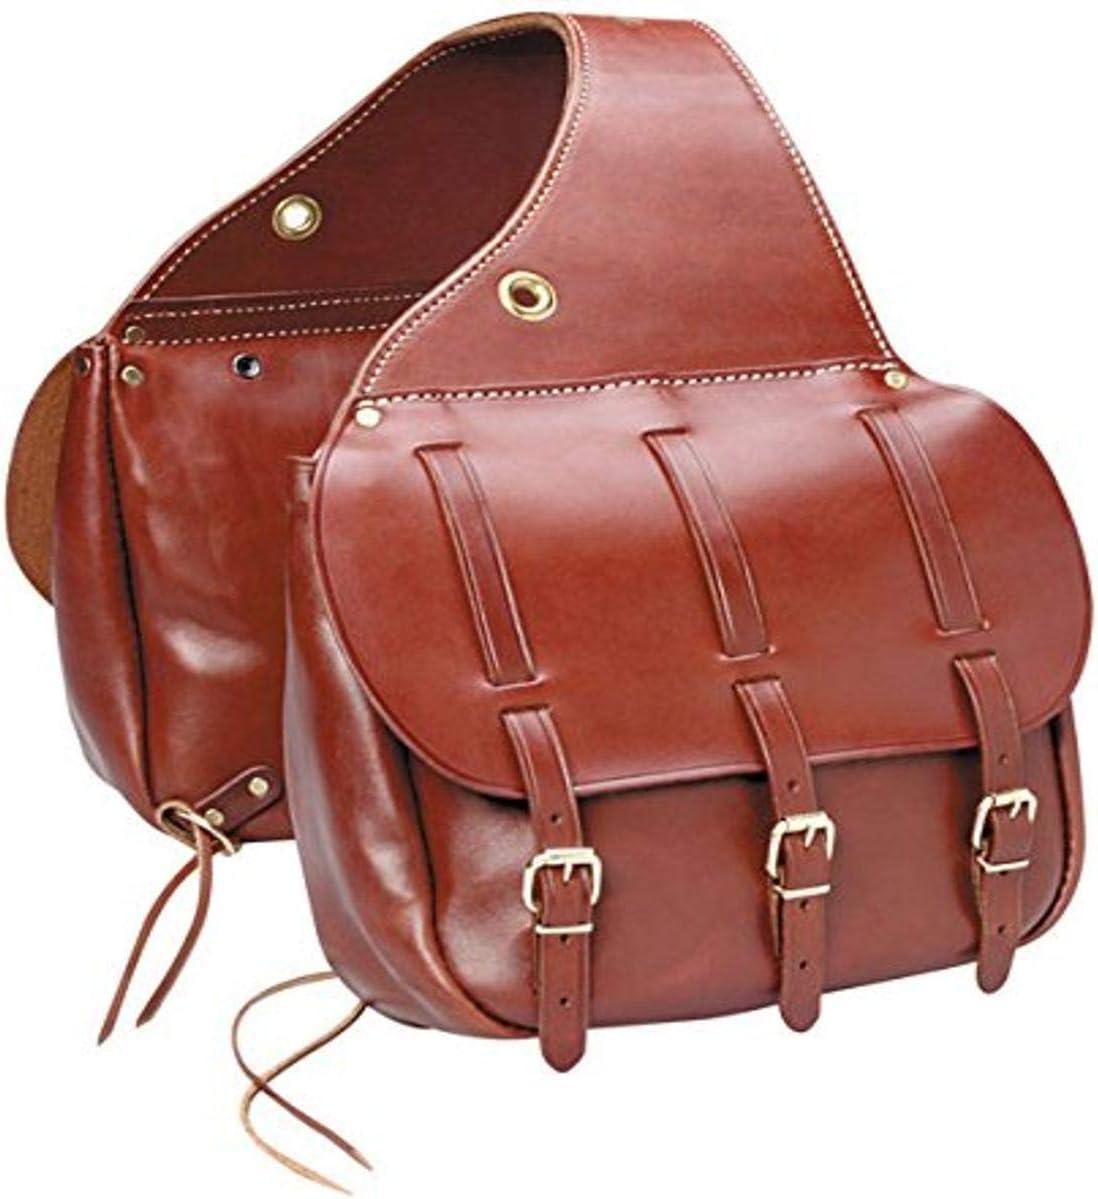 Triple K Brand Cavalry Saddle Bag Walnut Oil